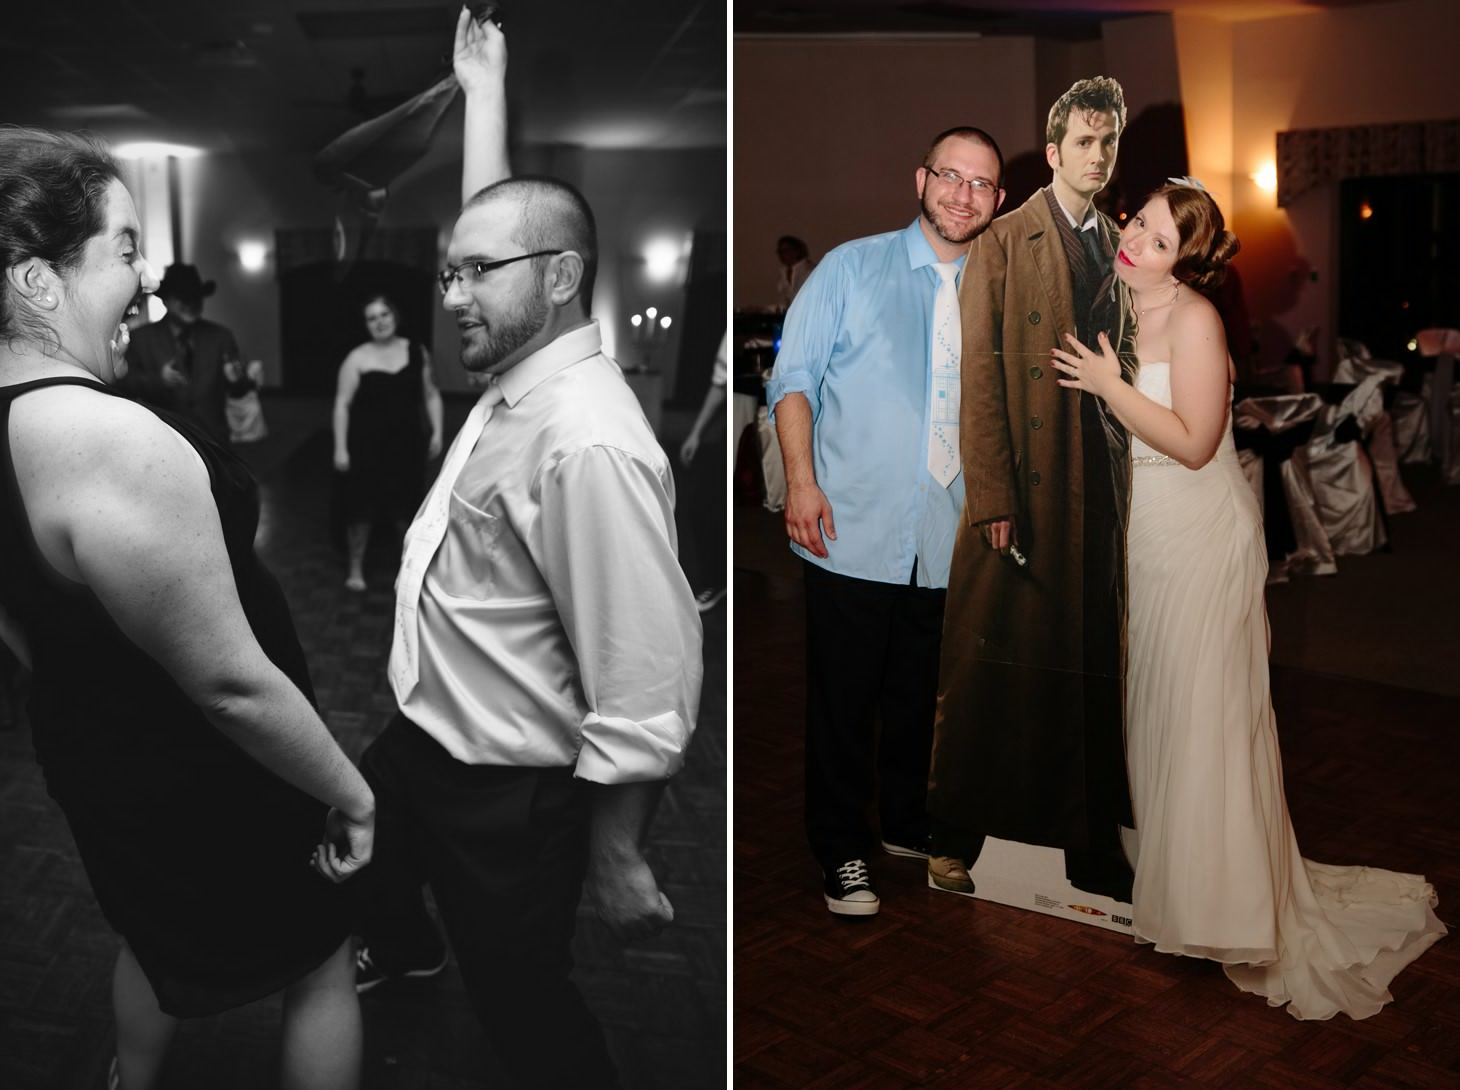 043-nyc-wedding-photographer-nj-nerdy-dr-who-firehouse-wedding-smitten-chickens.jpg